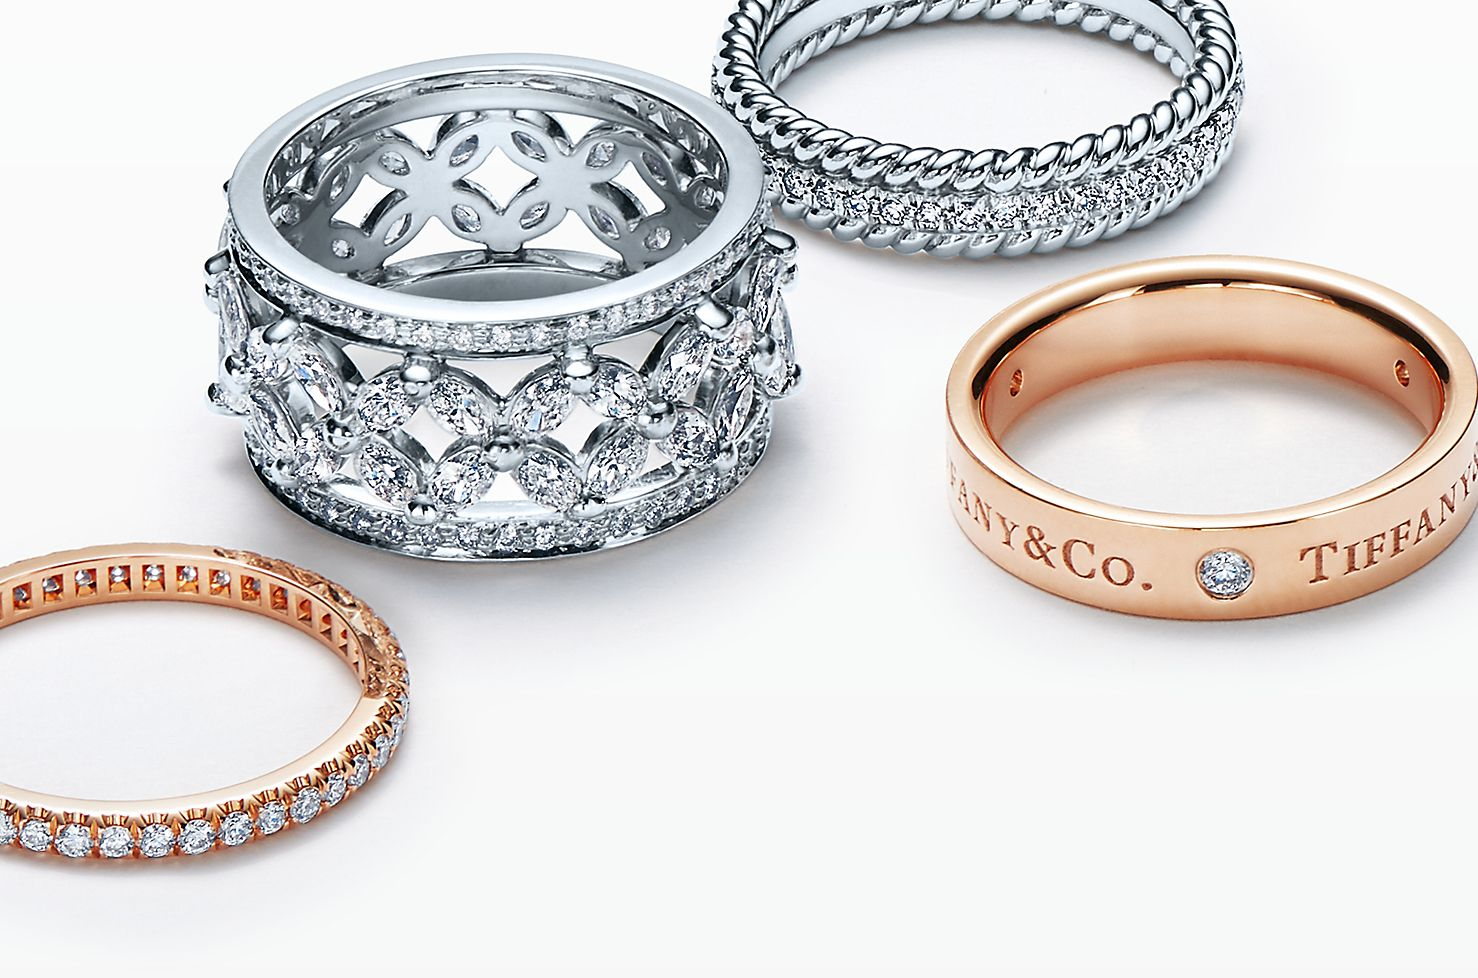 Tiffanys Wedding Rings 009 - Tiffanys Wedding Rings